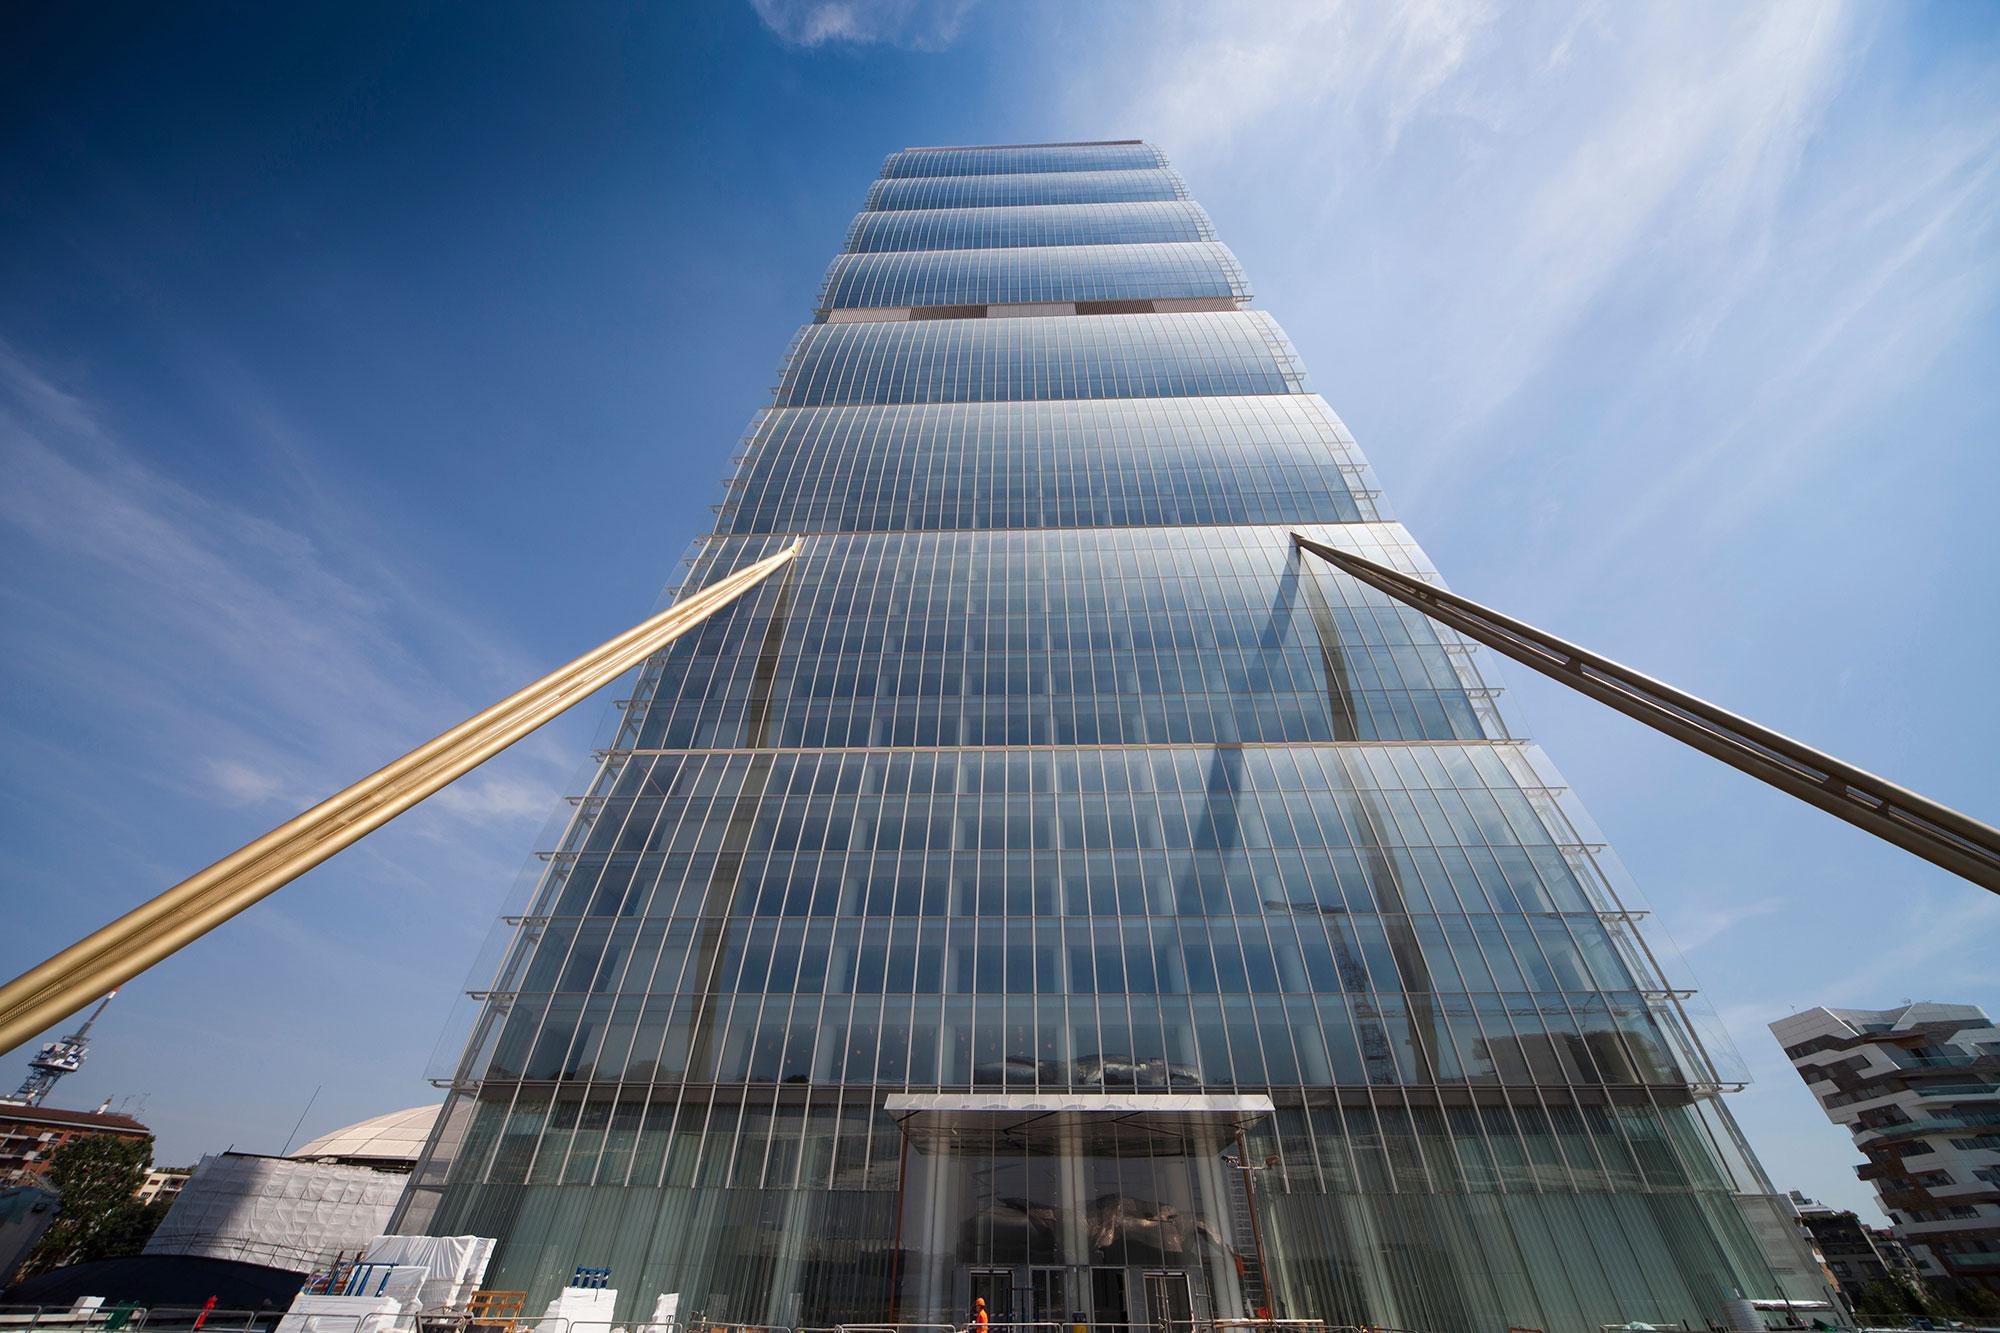 ALLIANZ TOWER (MILANO)